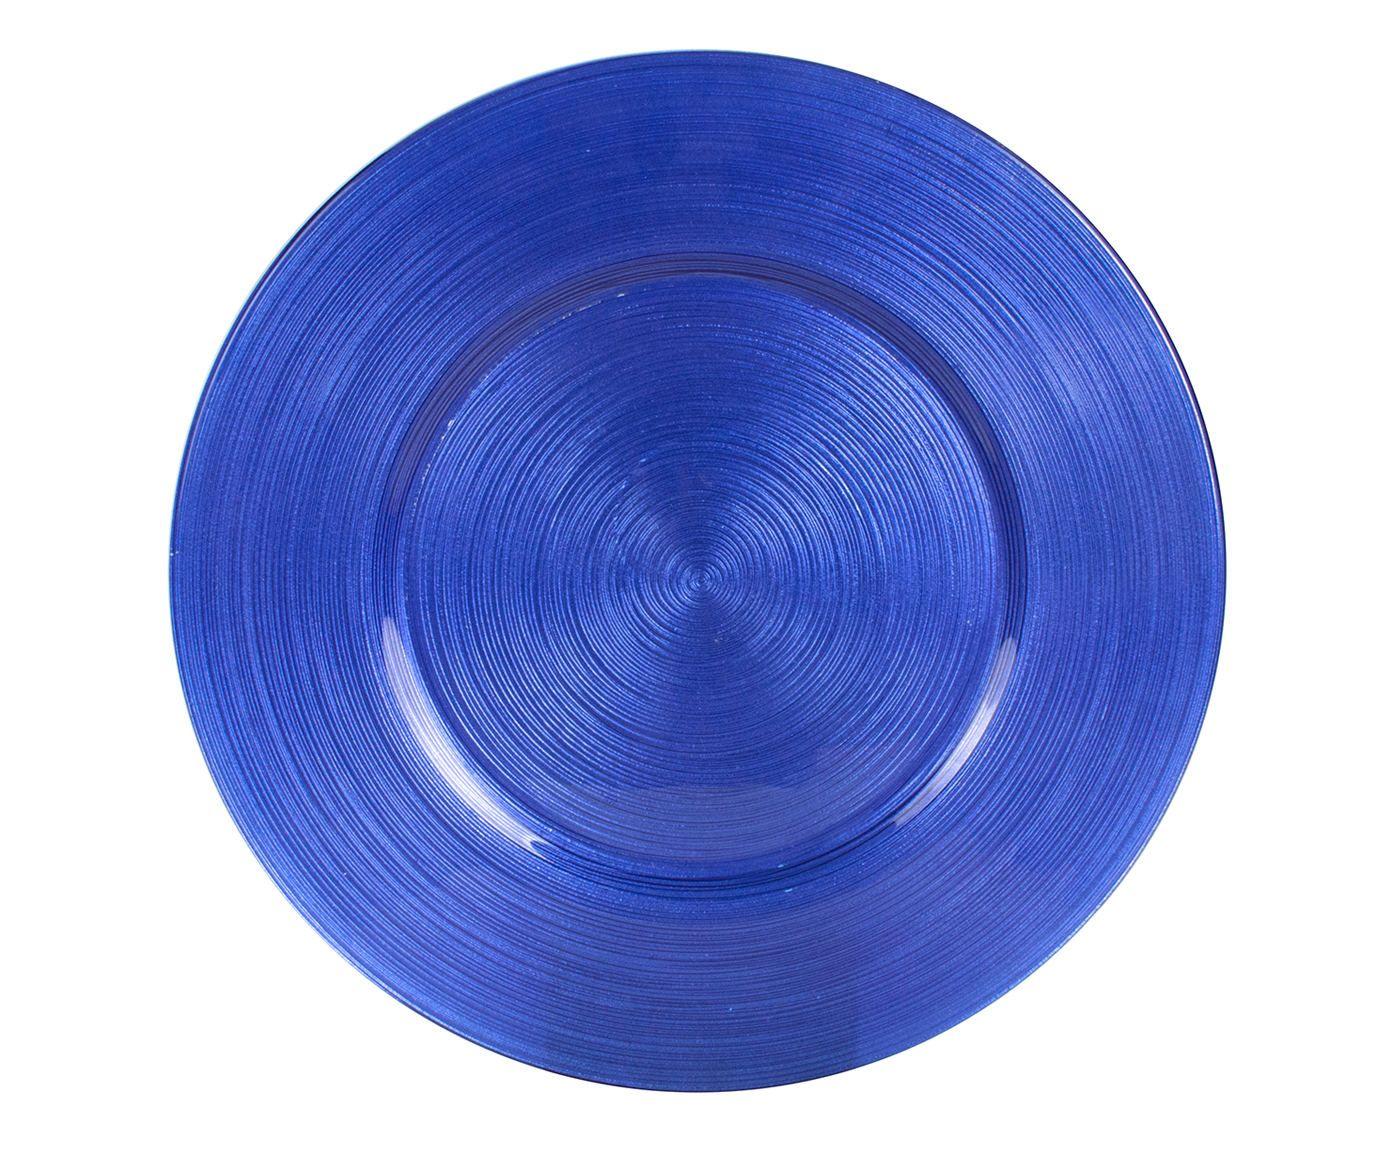 Sousplat Circlea Azul - 33cm | Westwing.com.br